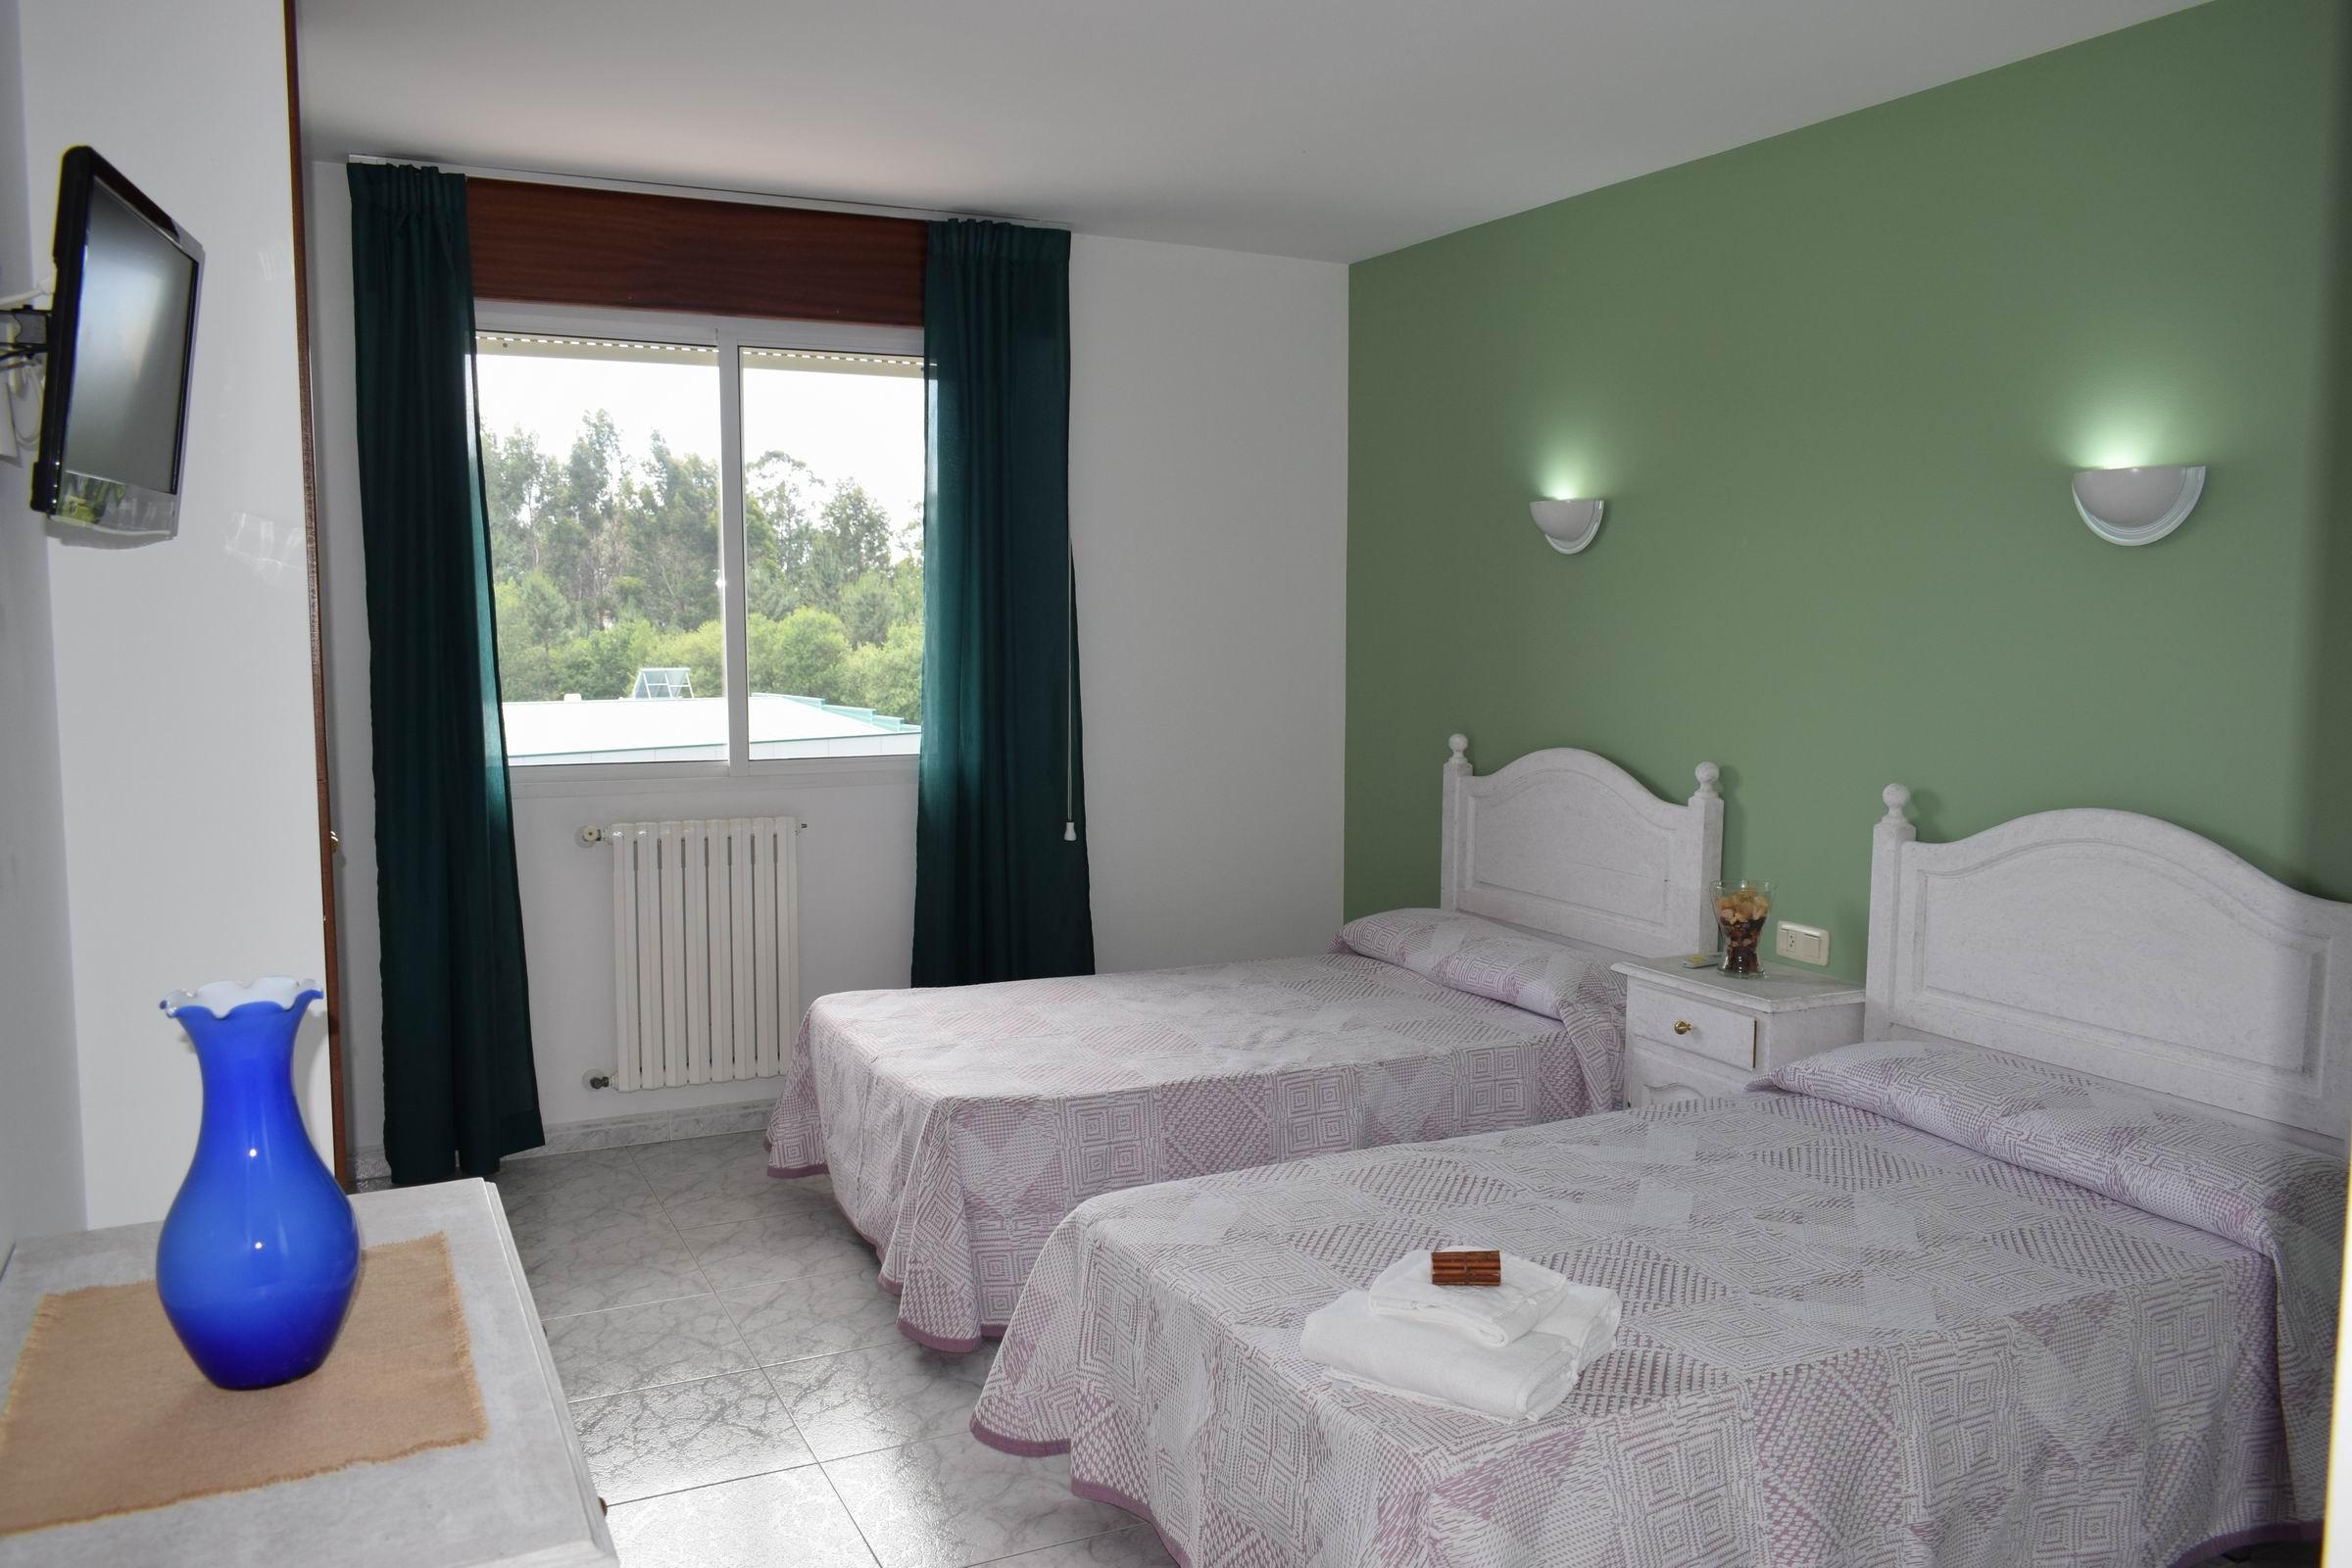 Hotel VIDA Xunca Blanca  -  06 Hab Estandar 1